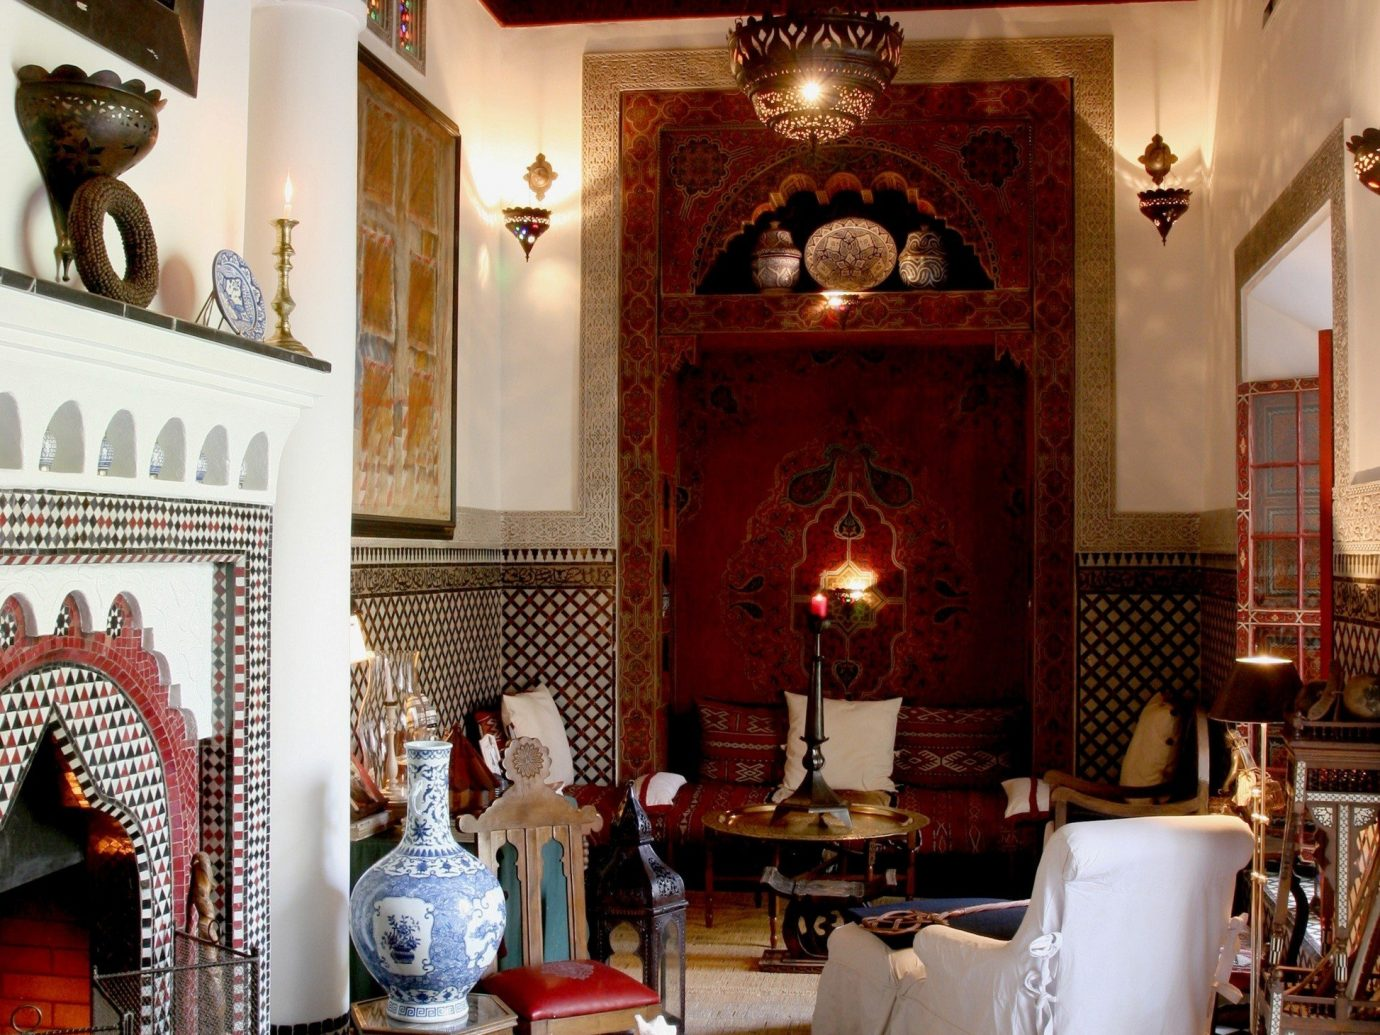 Hotels indoor floor room Living home restaurant interior design living room estate furniture decorated